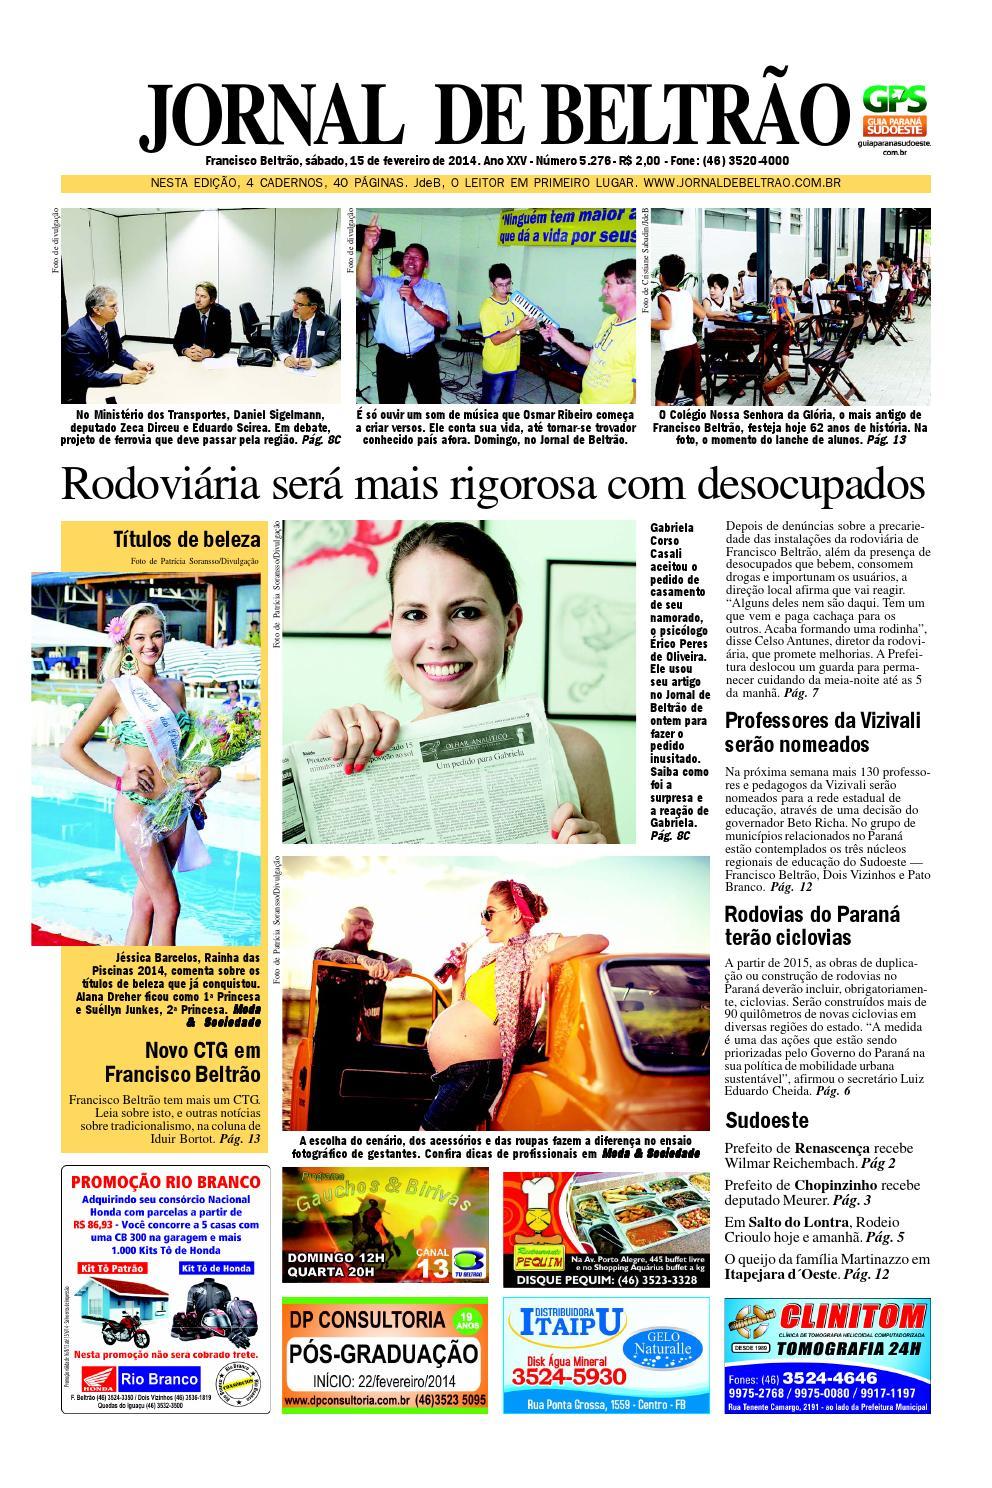 a2b3216b8 Jornaldebeltrão 5276 2014 02 15 by Orangotoe - issuu